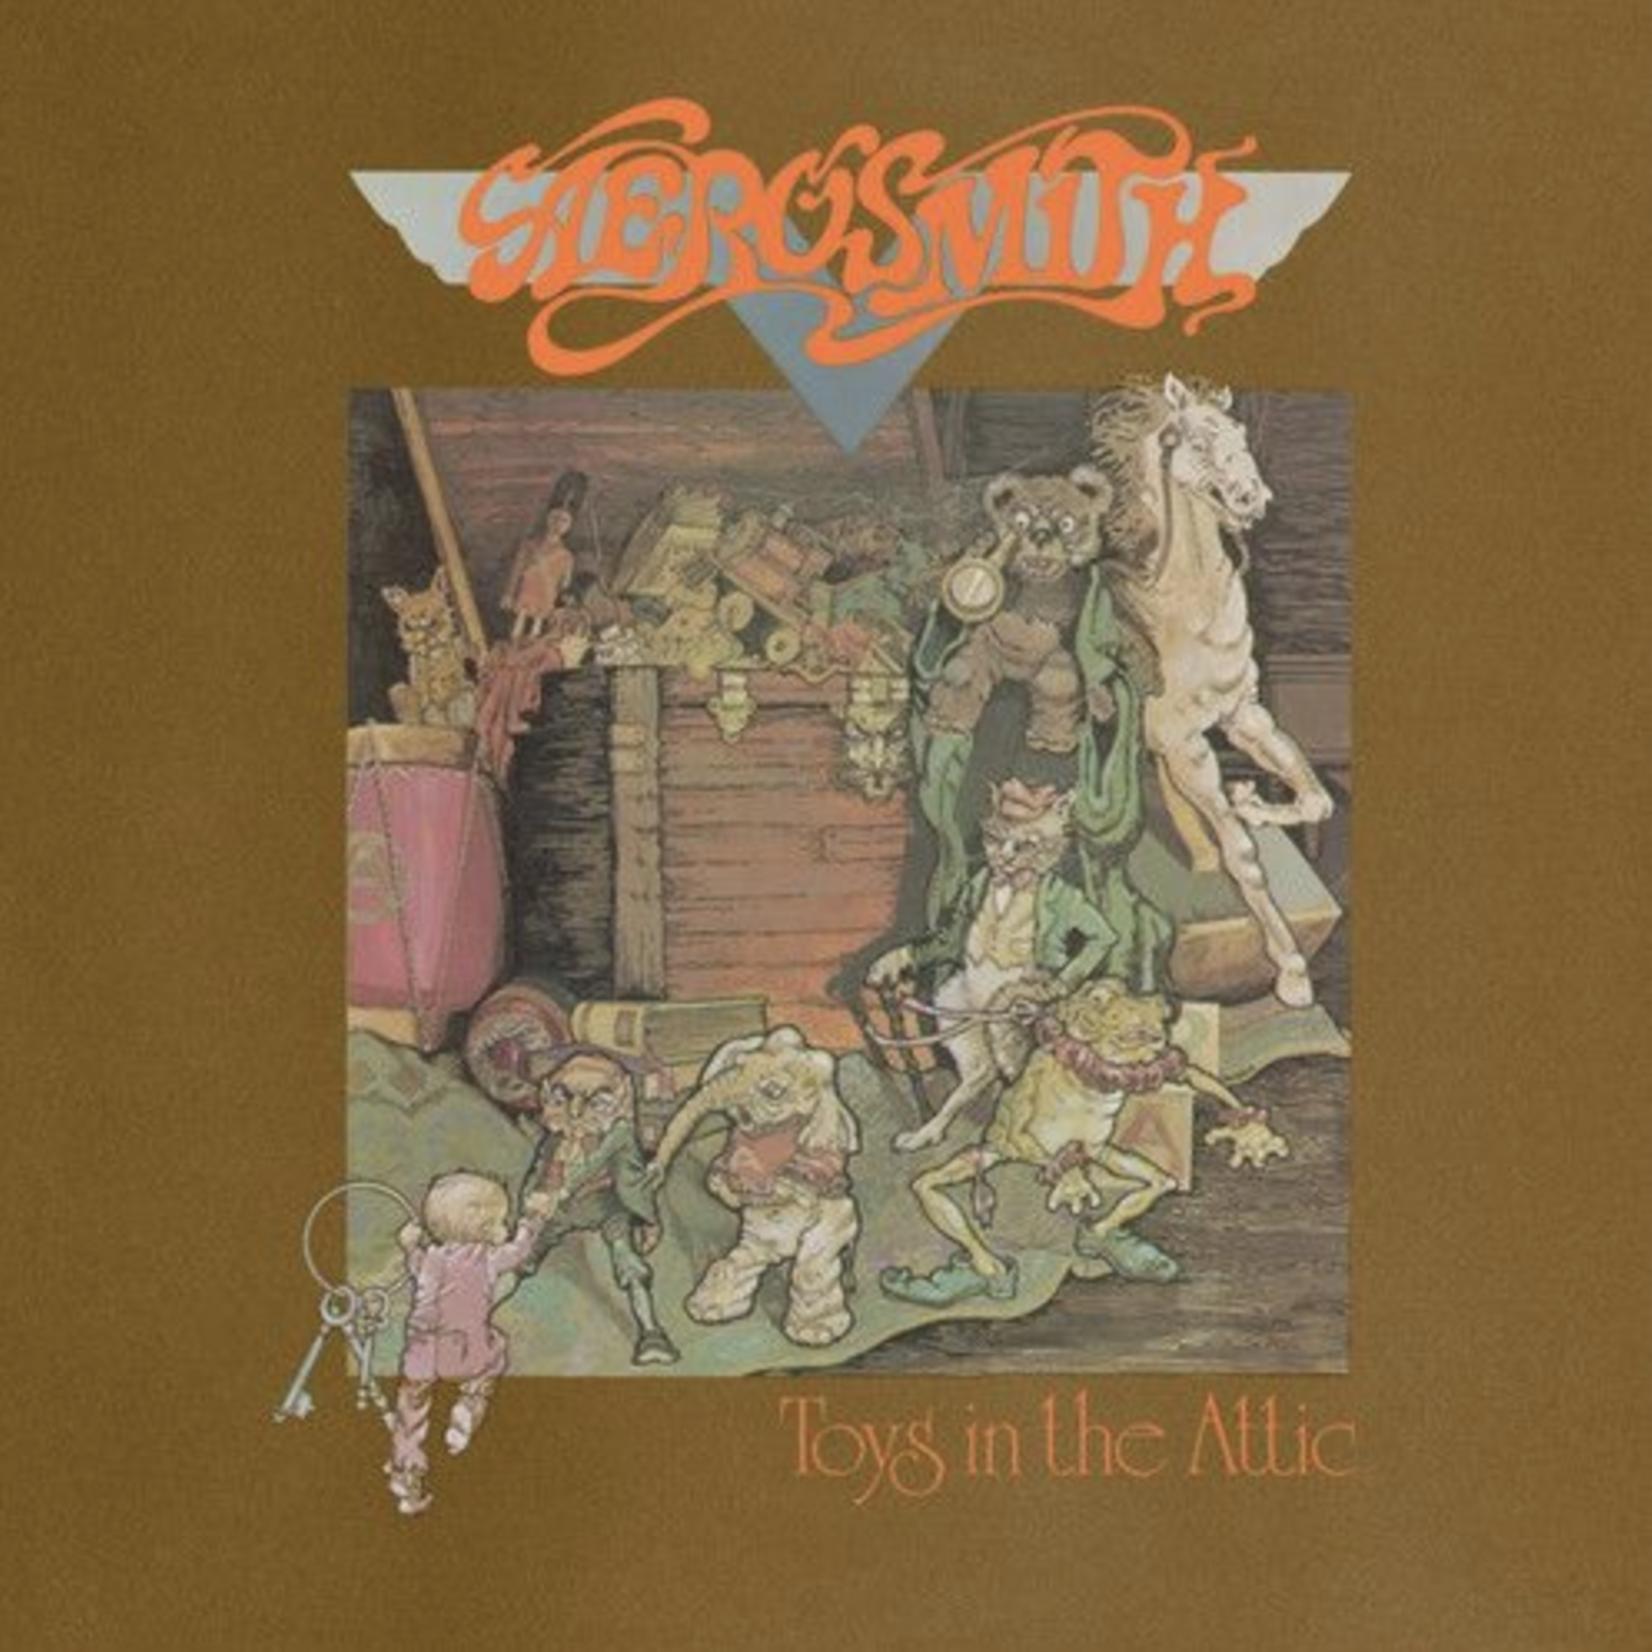 Monostereo Aerosmith Toys In The Attic